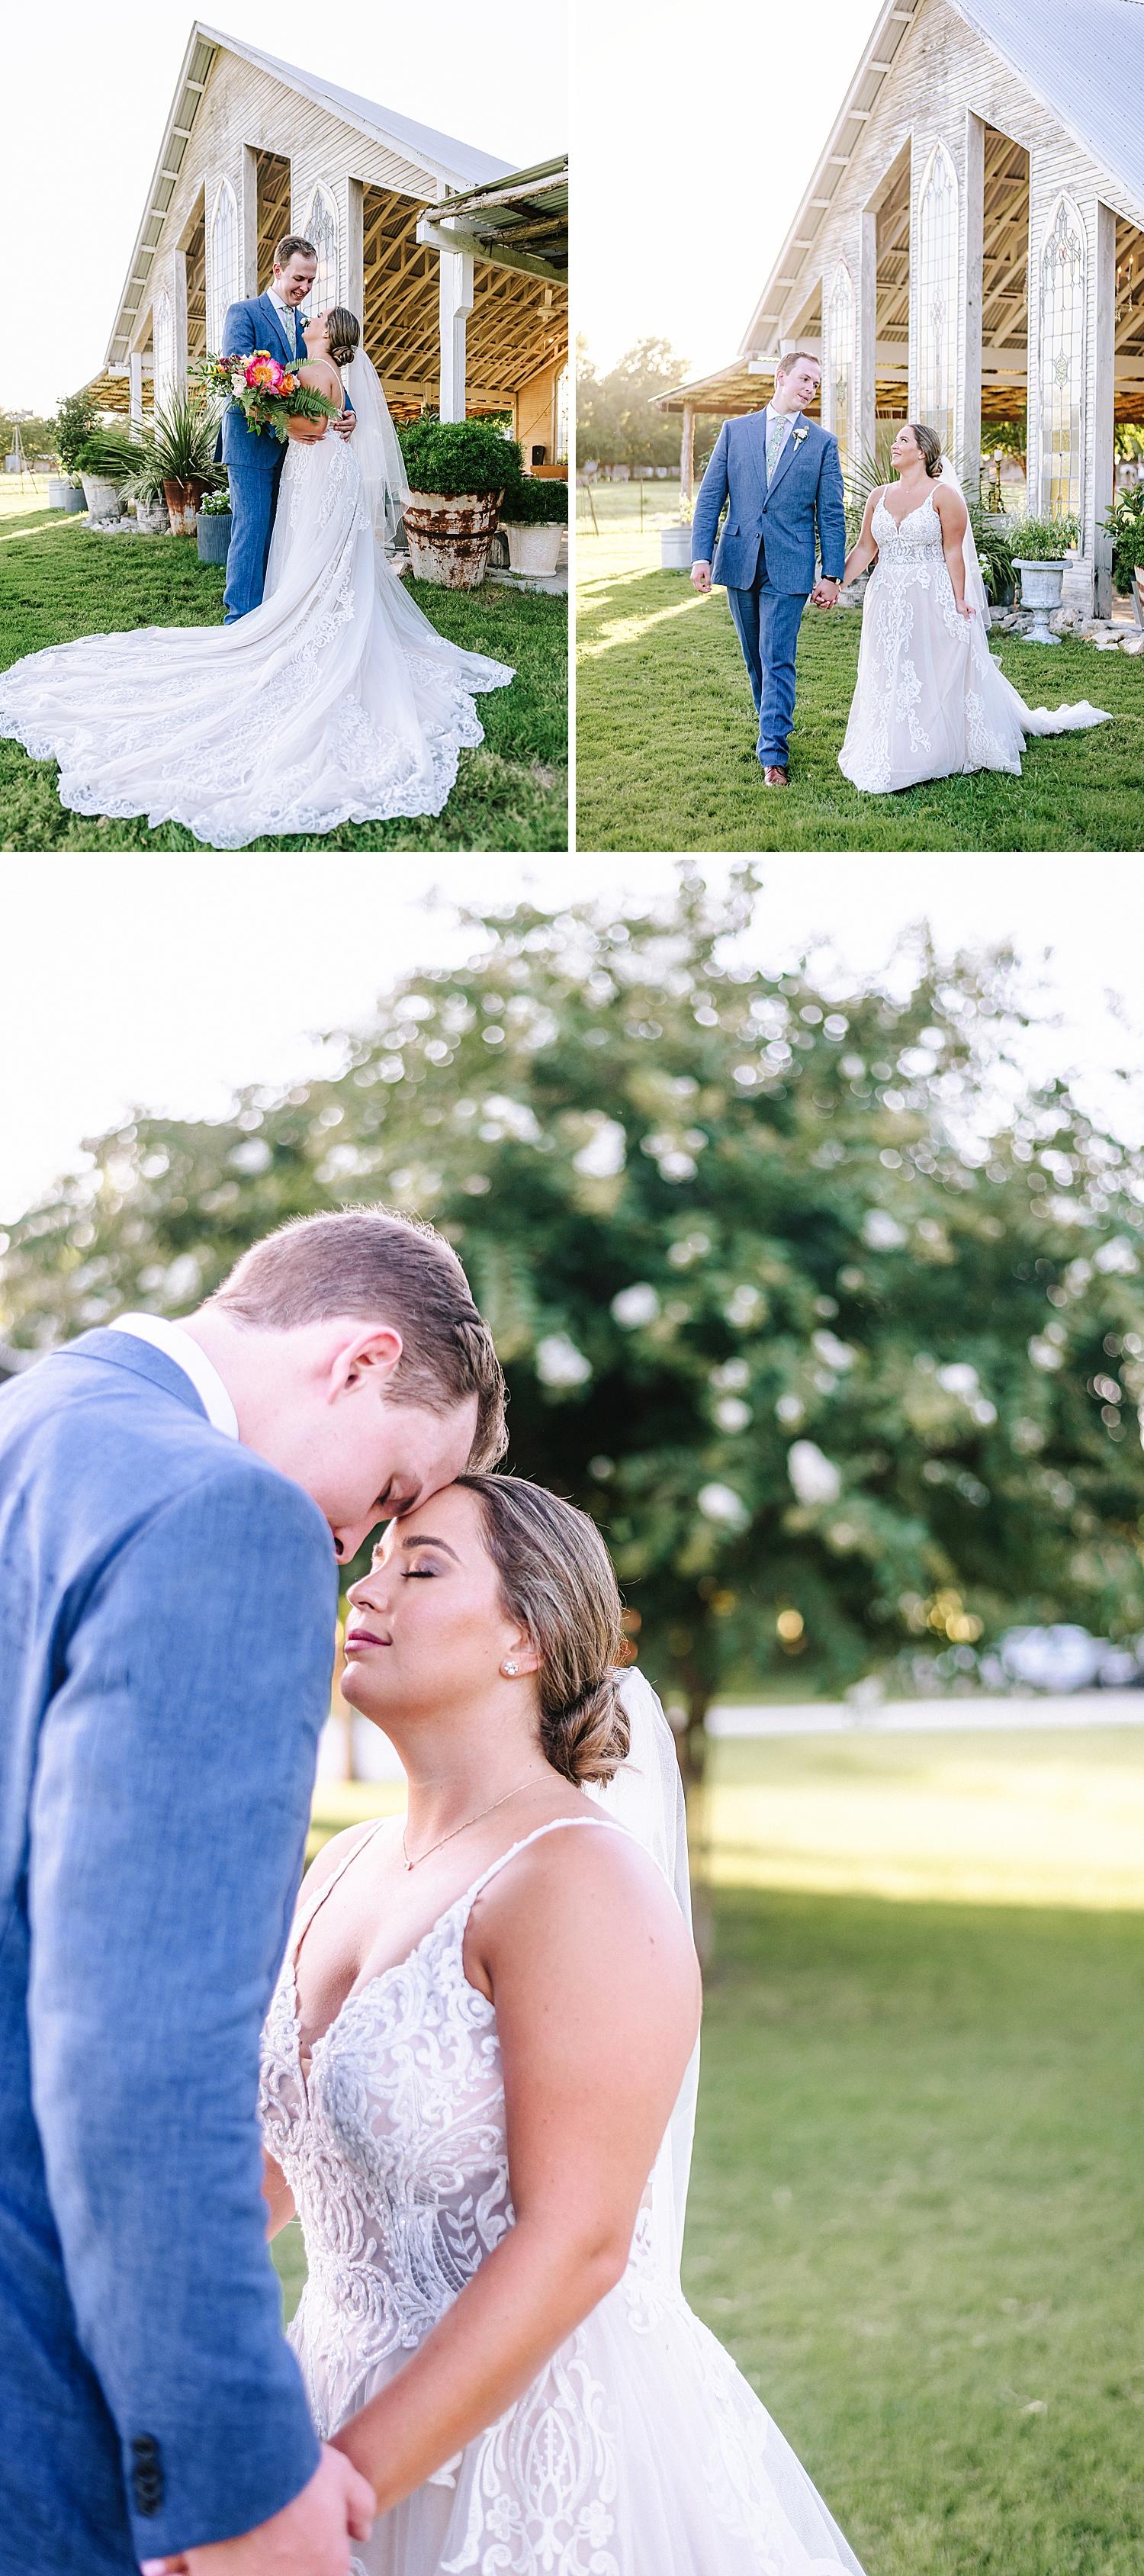 Gruene-Estate-Wedding-New-Braunfels-Bride-Wedding-Photos-Carly-Barton-Photography_0120.jpg